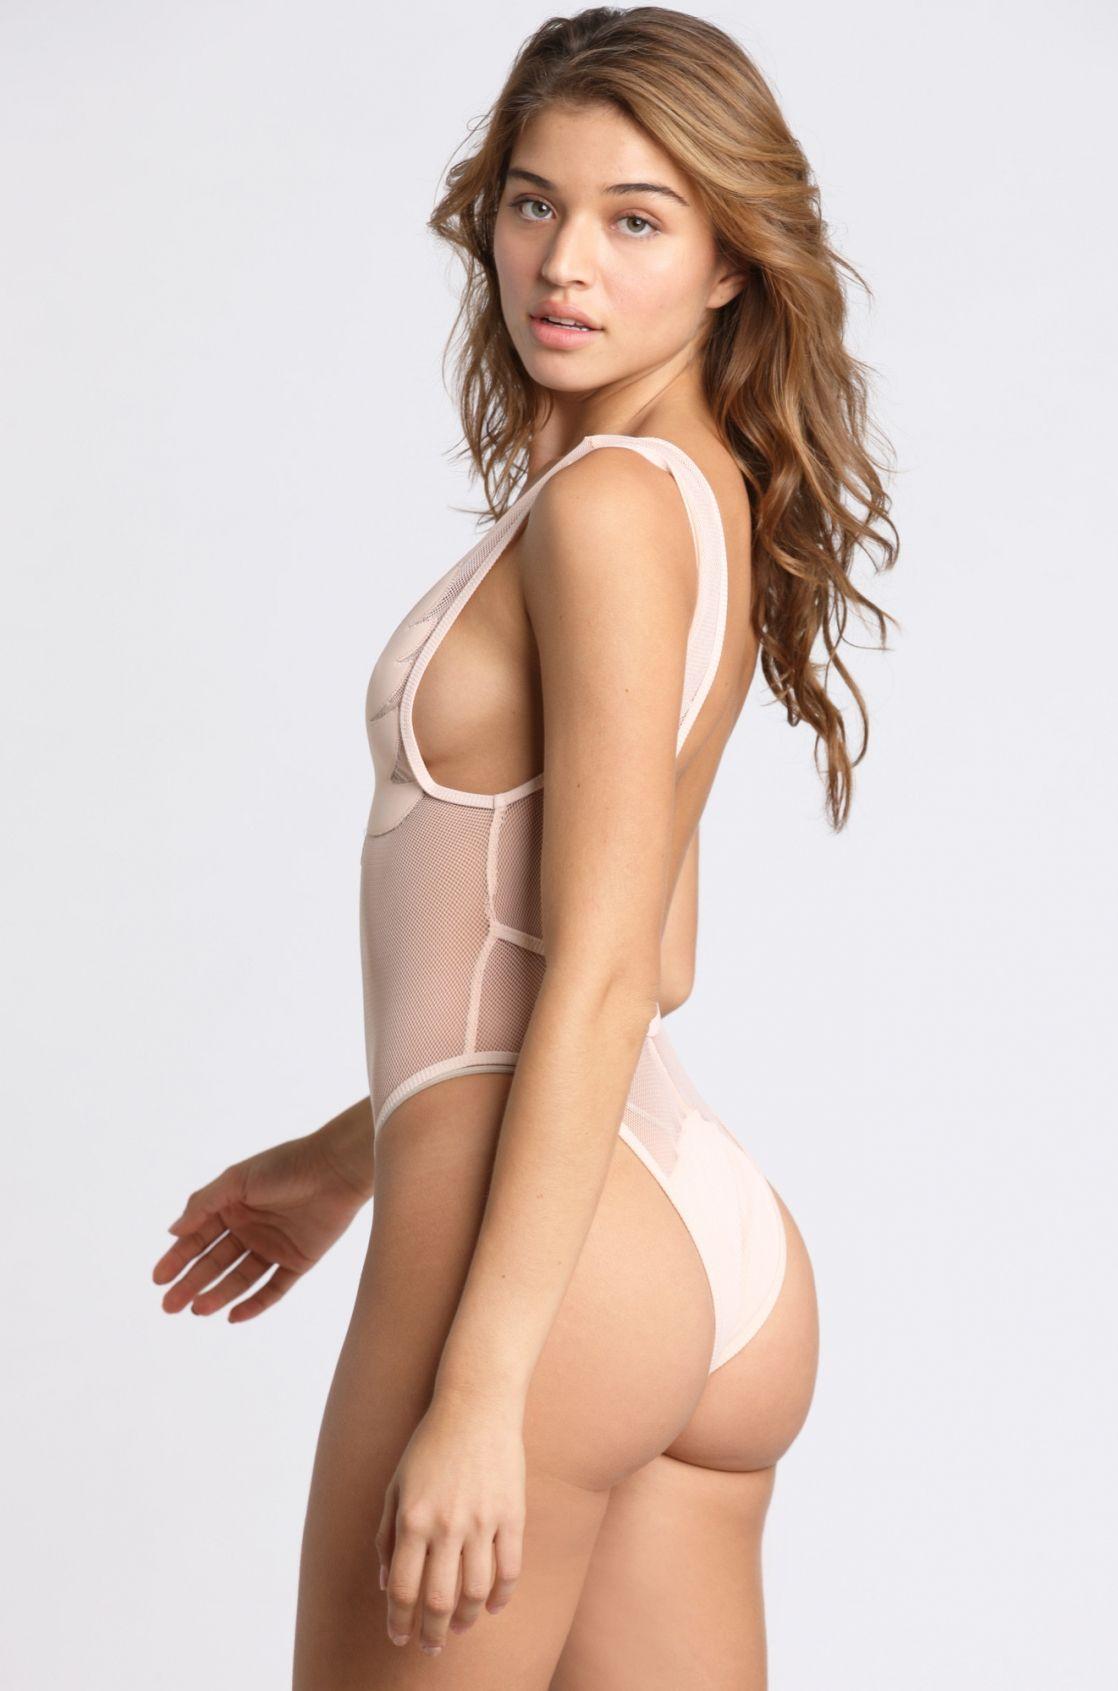 Hacked Daniela Lopez Osorio nude photos 2019